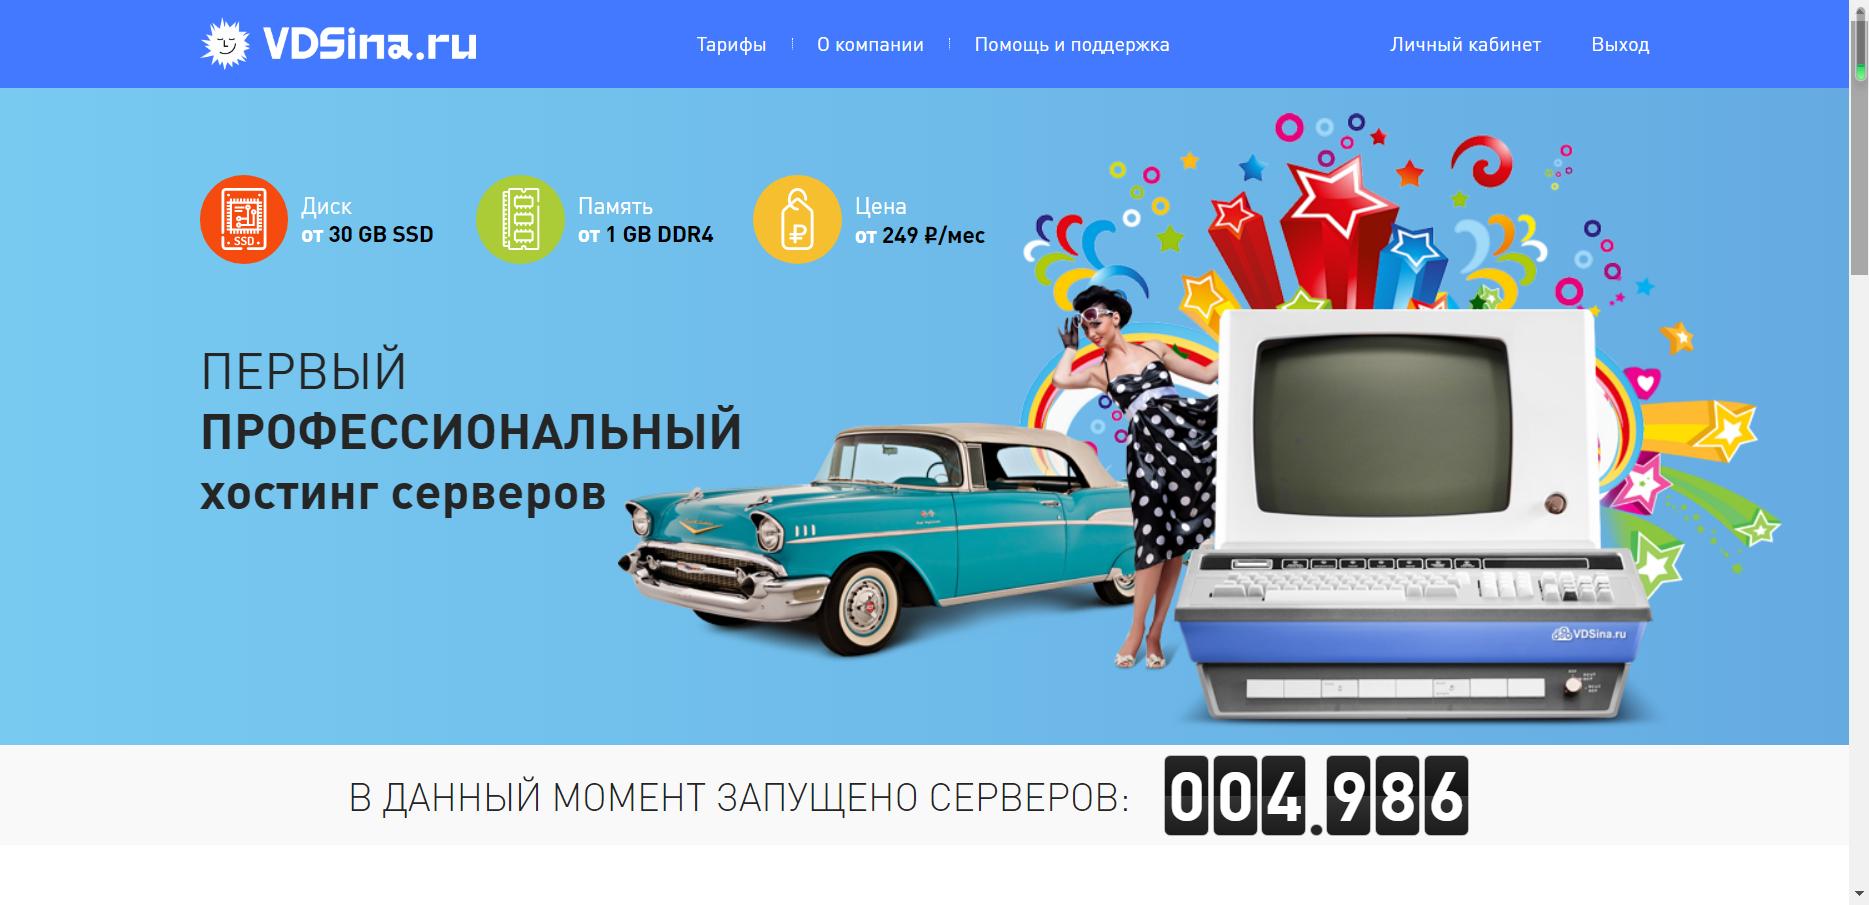 vdsina.ru